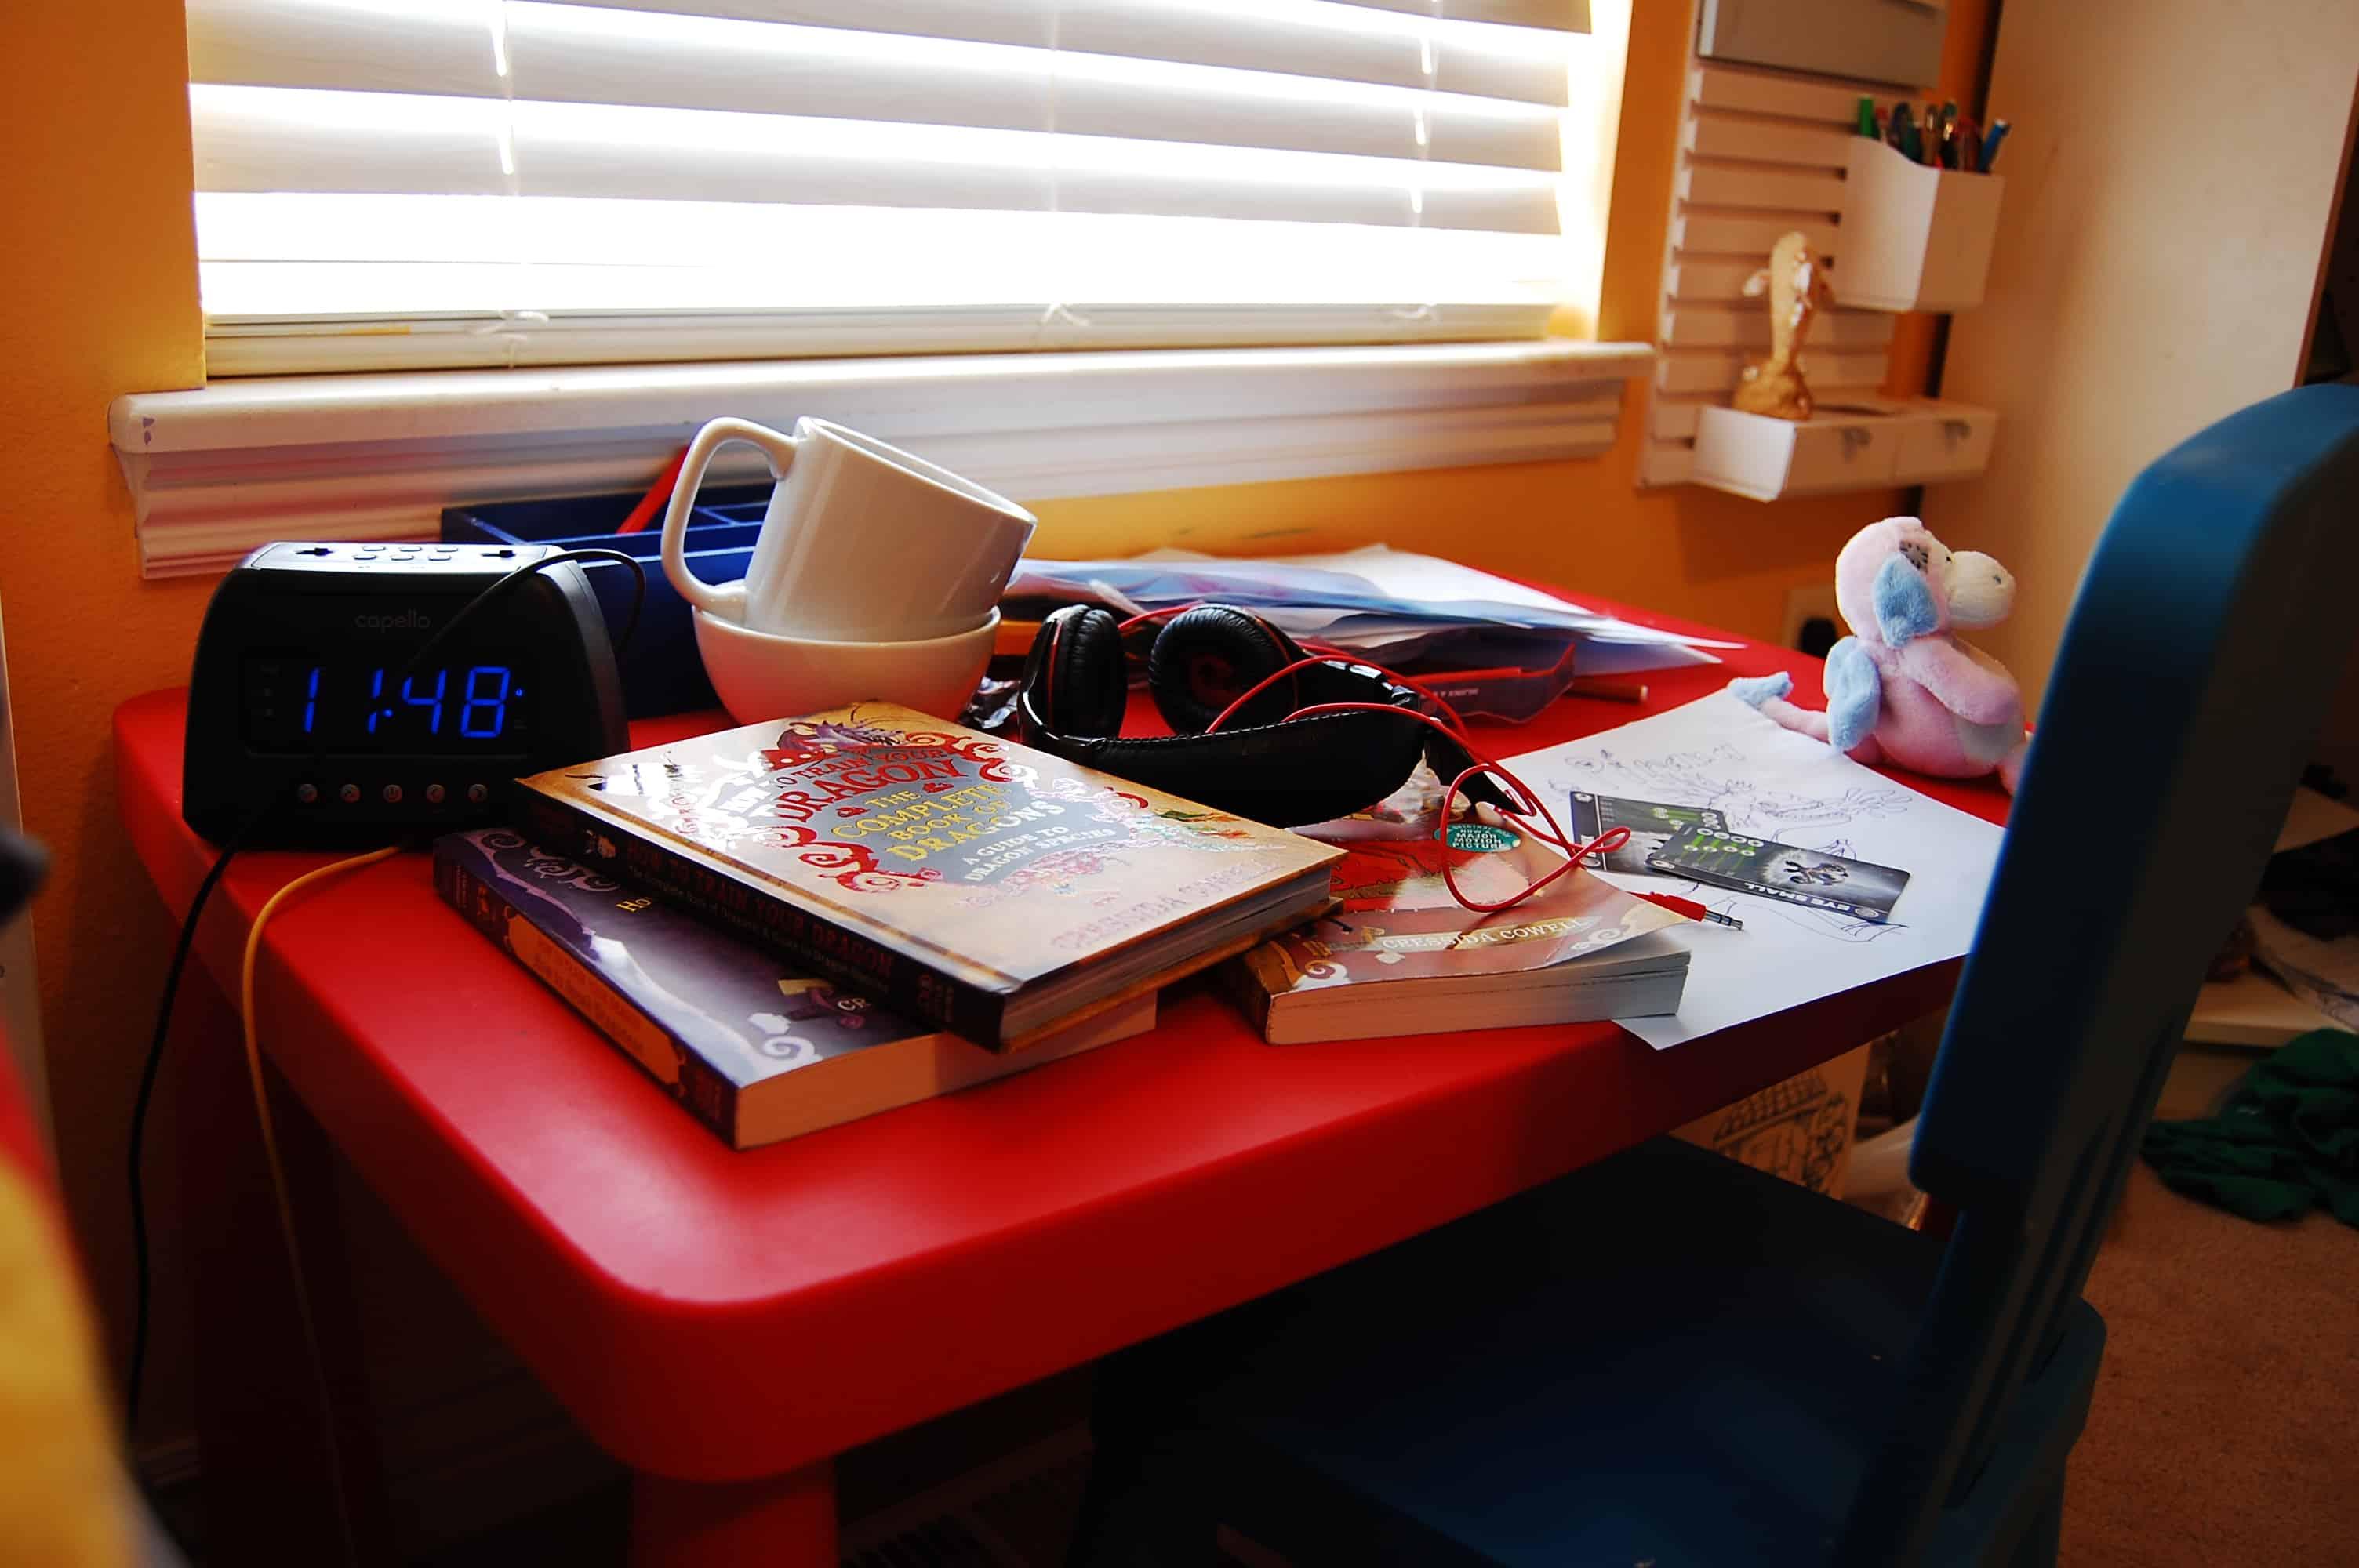 diy kids homework hideaway wall desk the organized mom